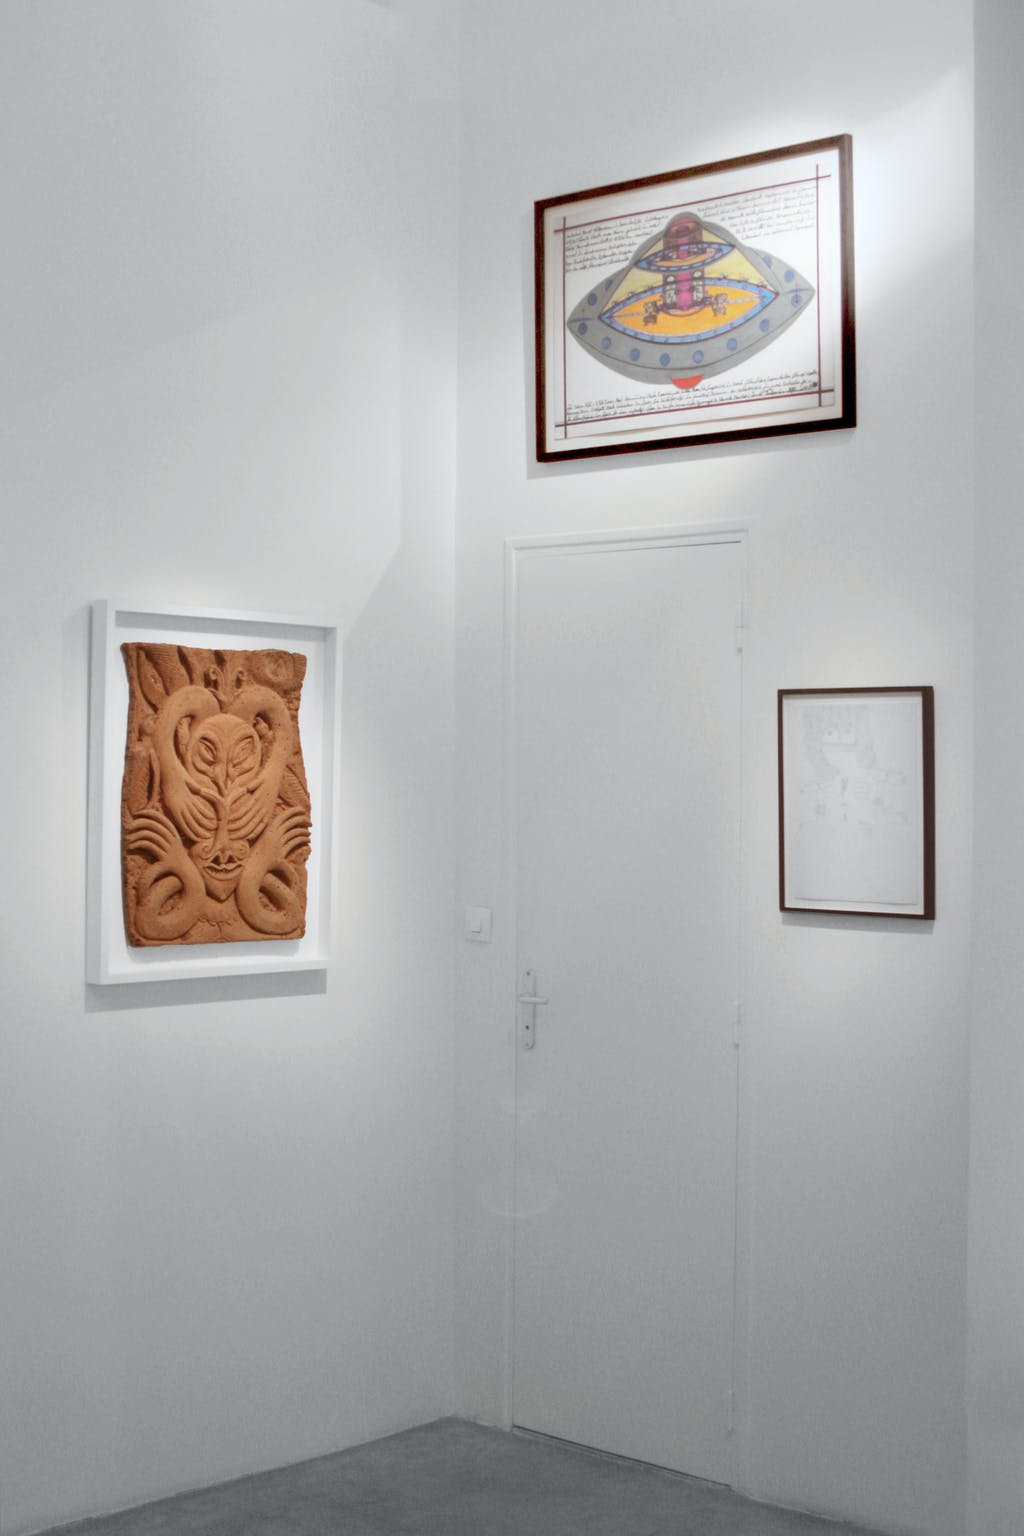 vue de l'exposition *soit dix ans : états intérieurs, exposition collective*, christian berst art brut, paris, 2015. - © christian berst art brut, christian berst — art brut